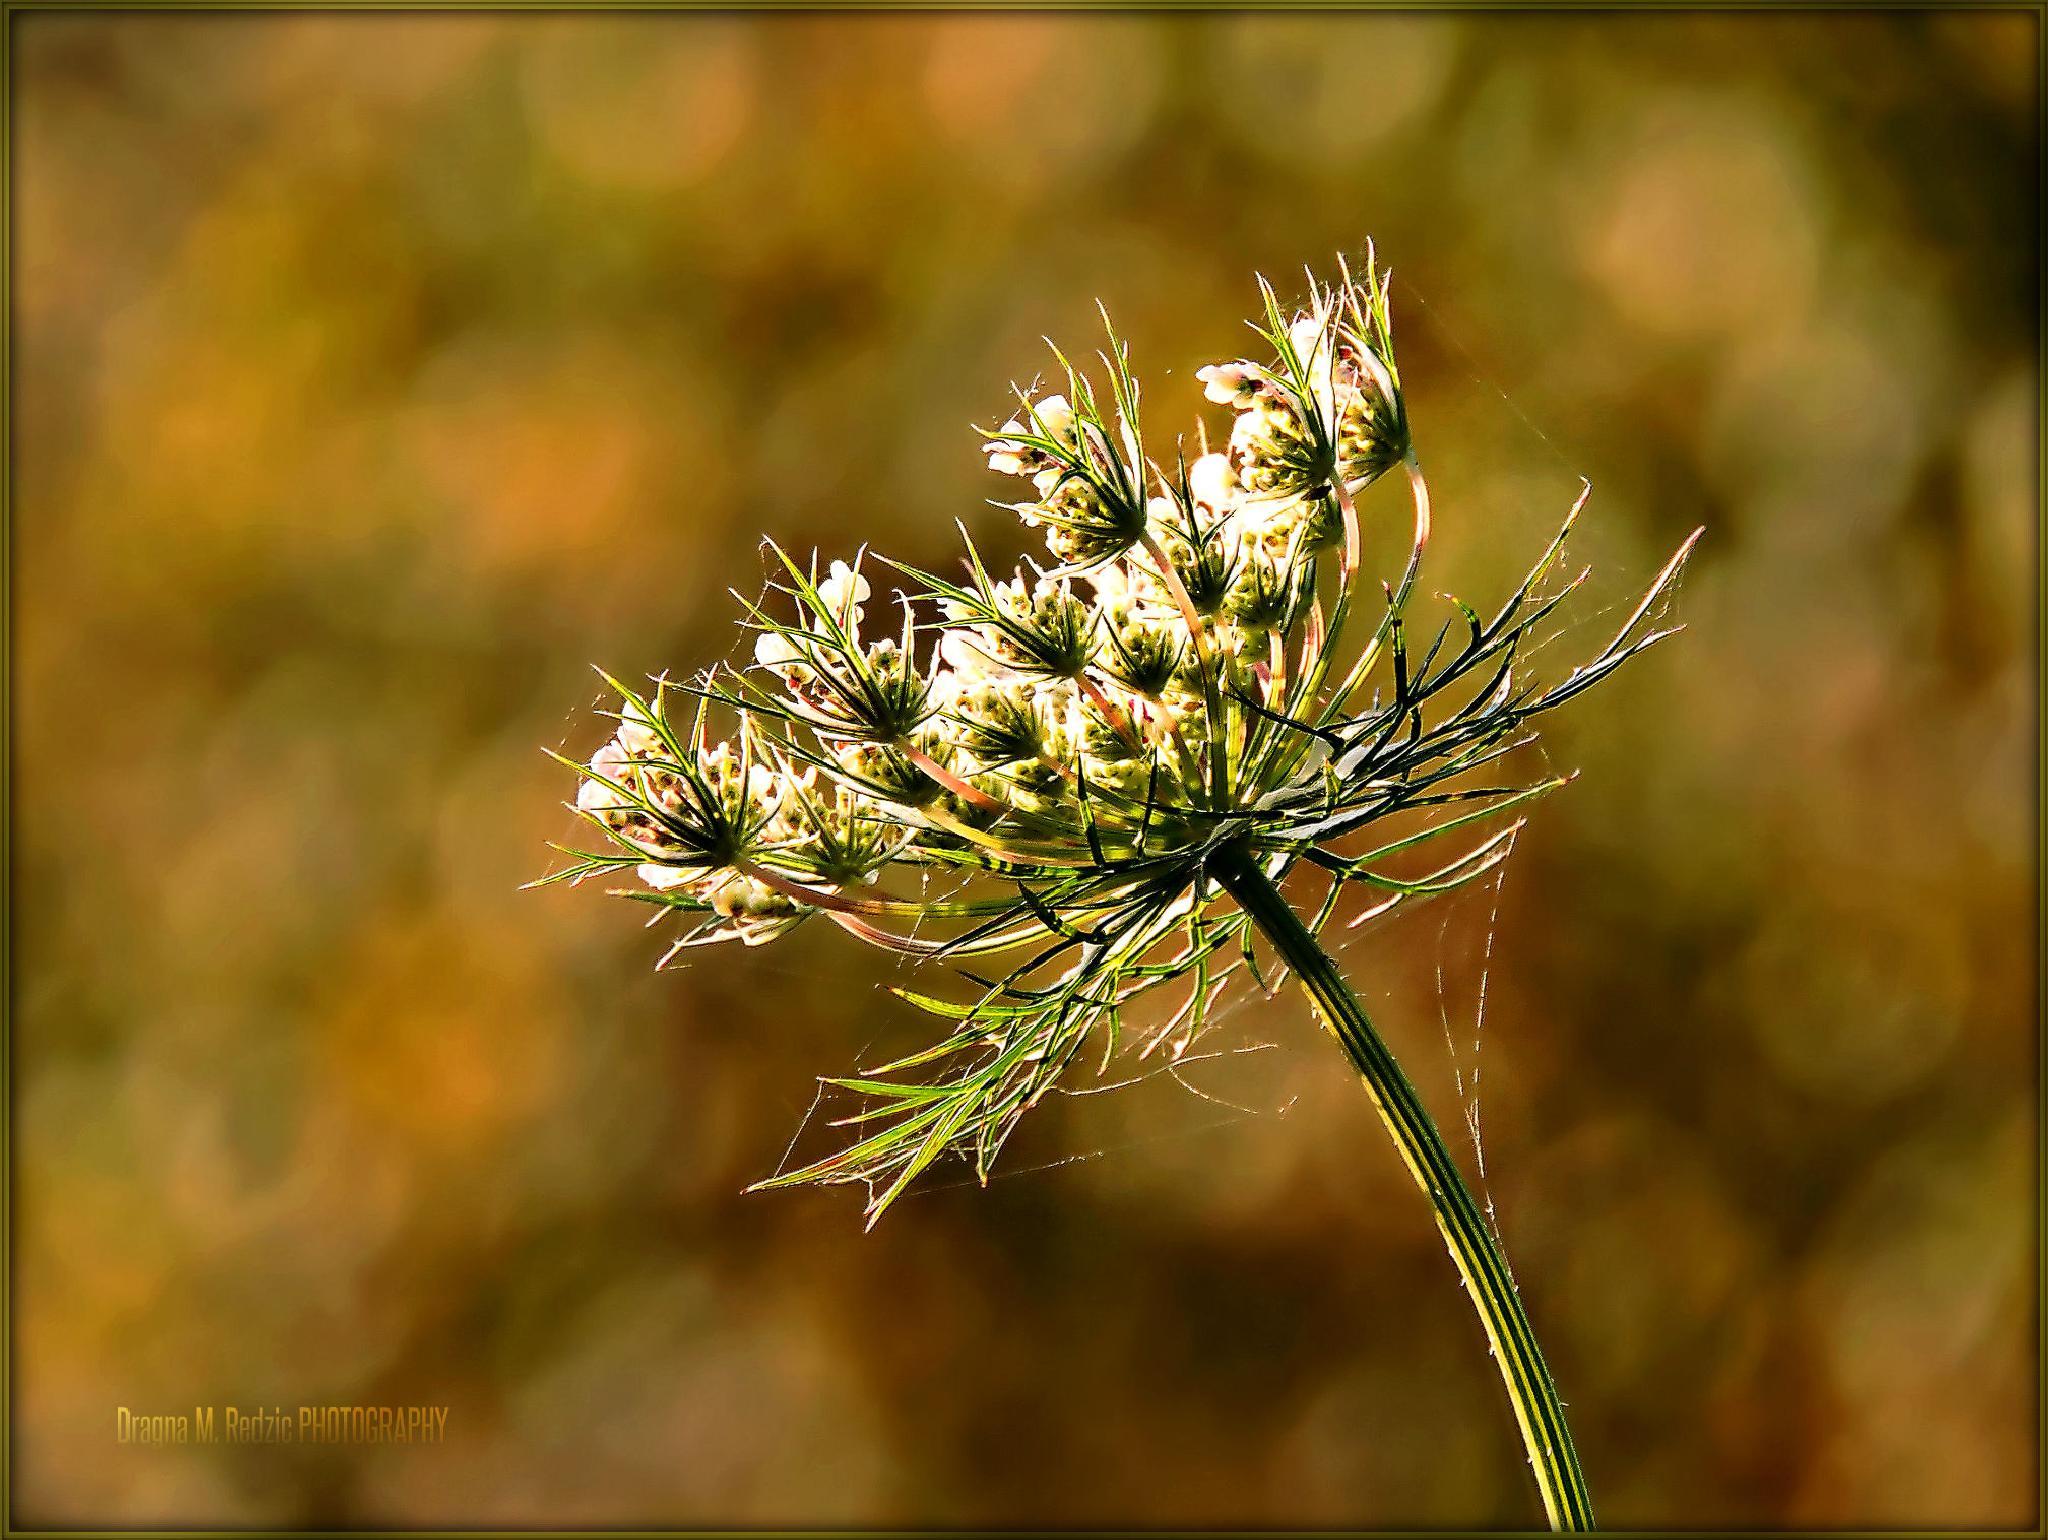 Daucus carota L. by Драгана М. Реџић